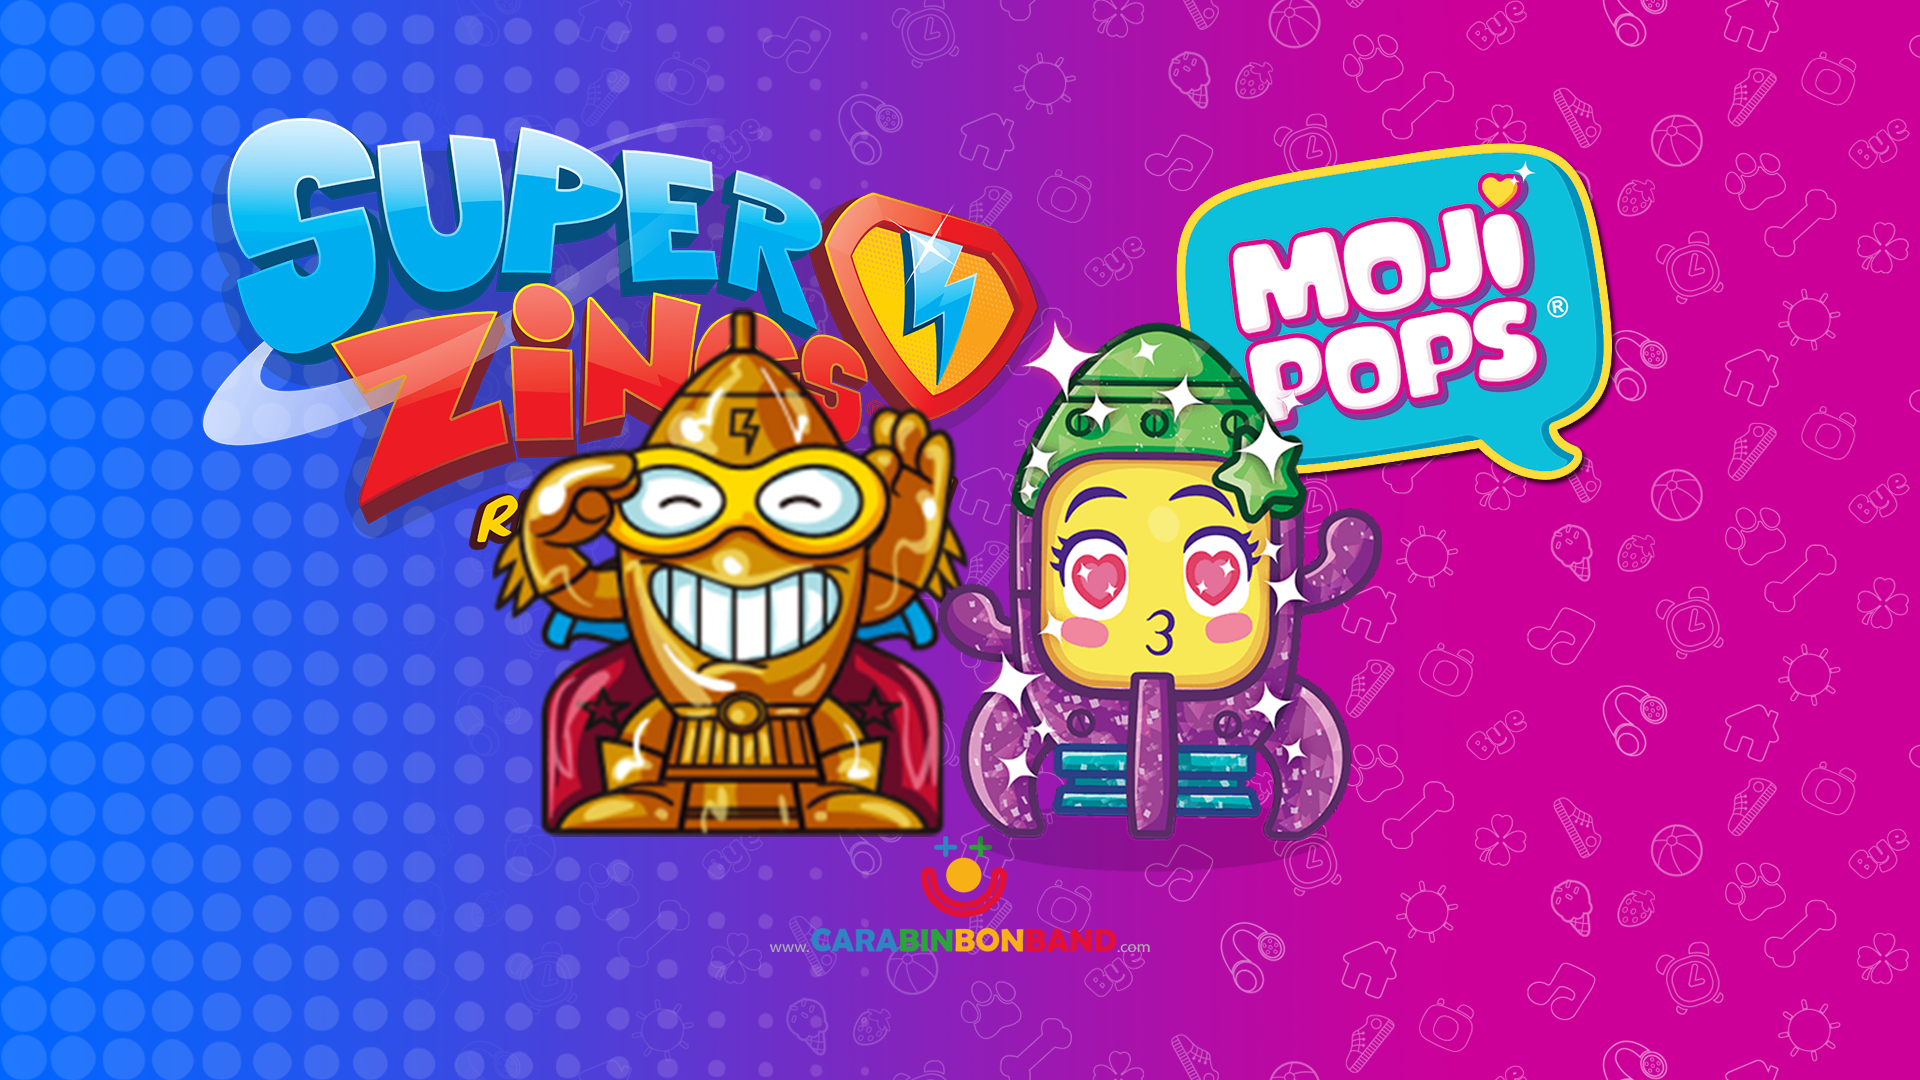 Comparando MOJIPOPS Serie 1 Y SUPERZINGS - Personajes similares